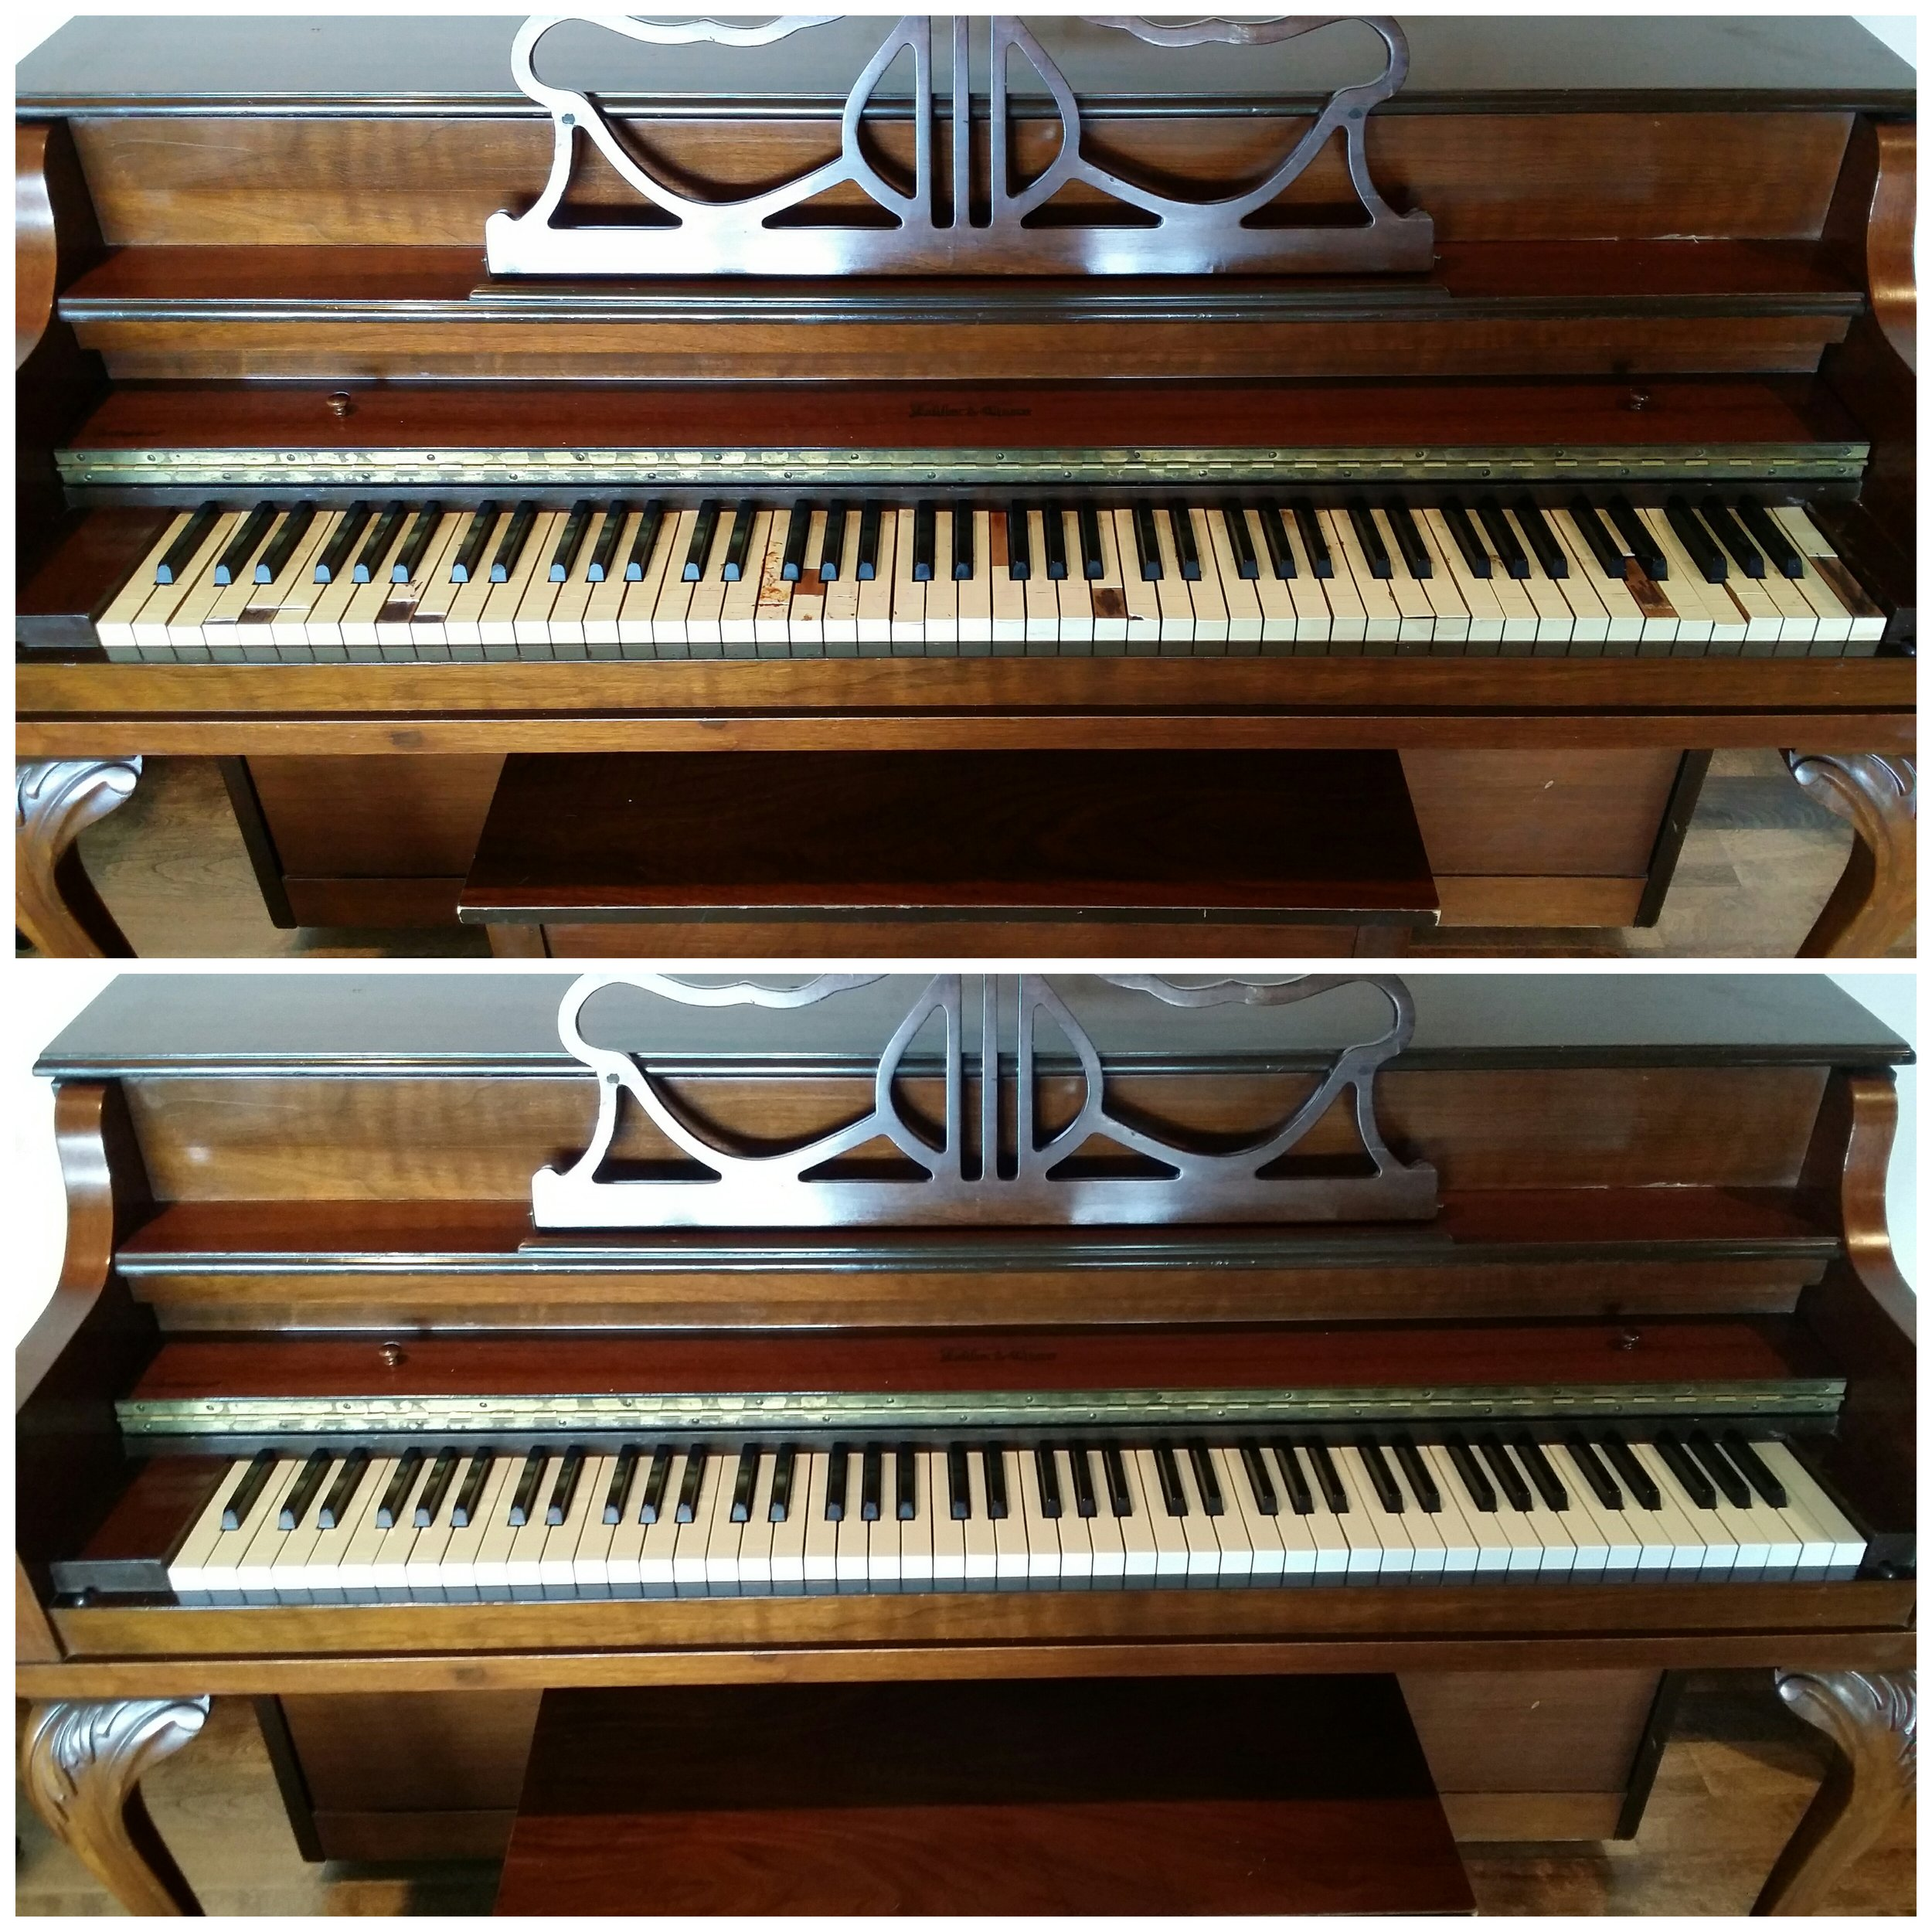 Piano Keytops Before and After